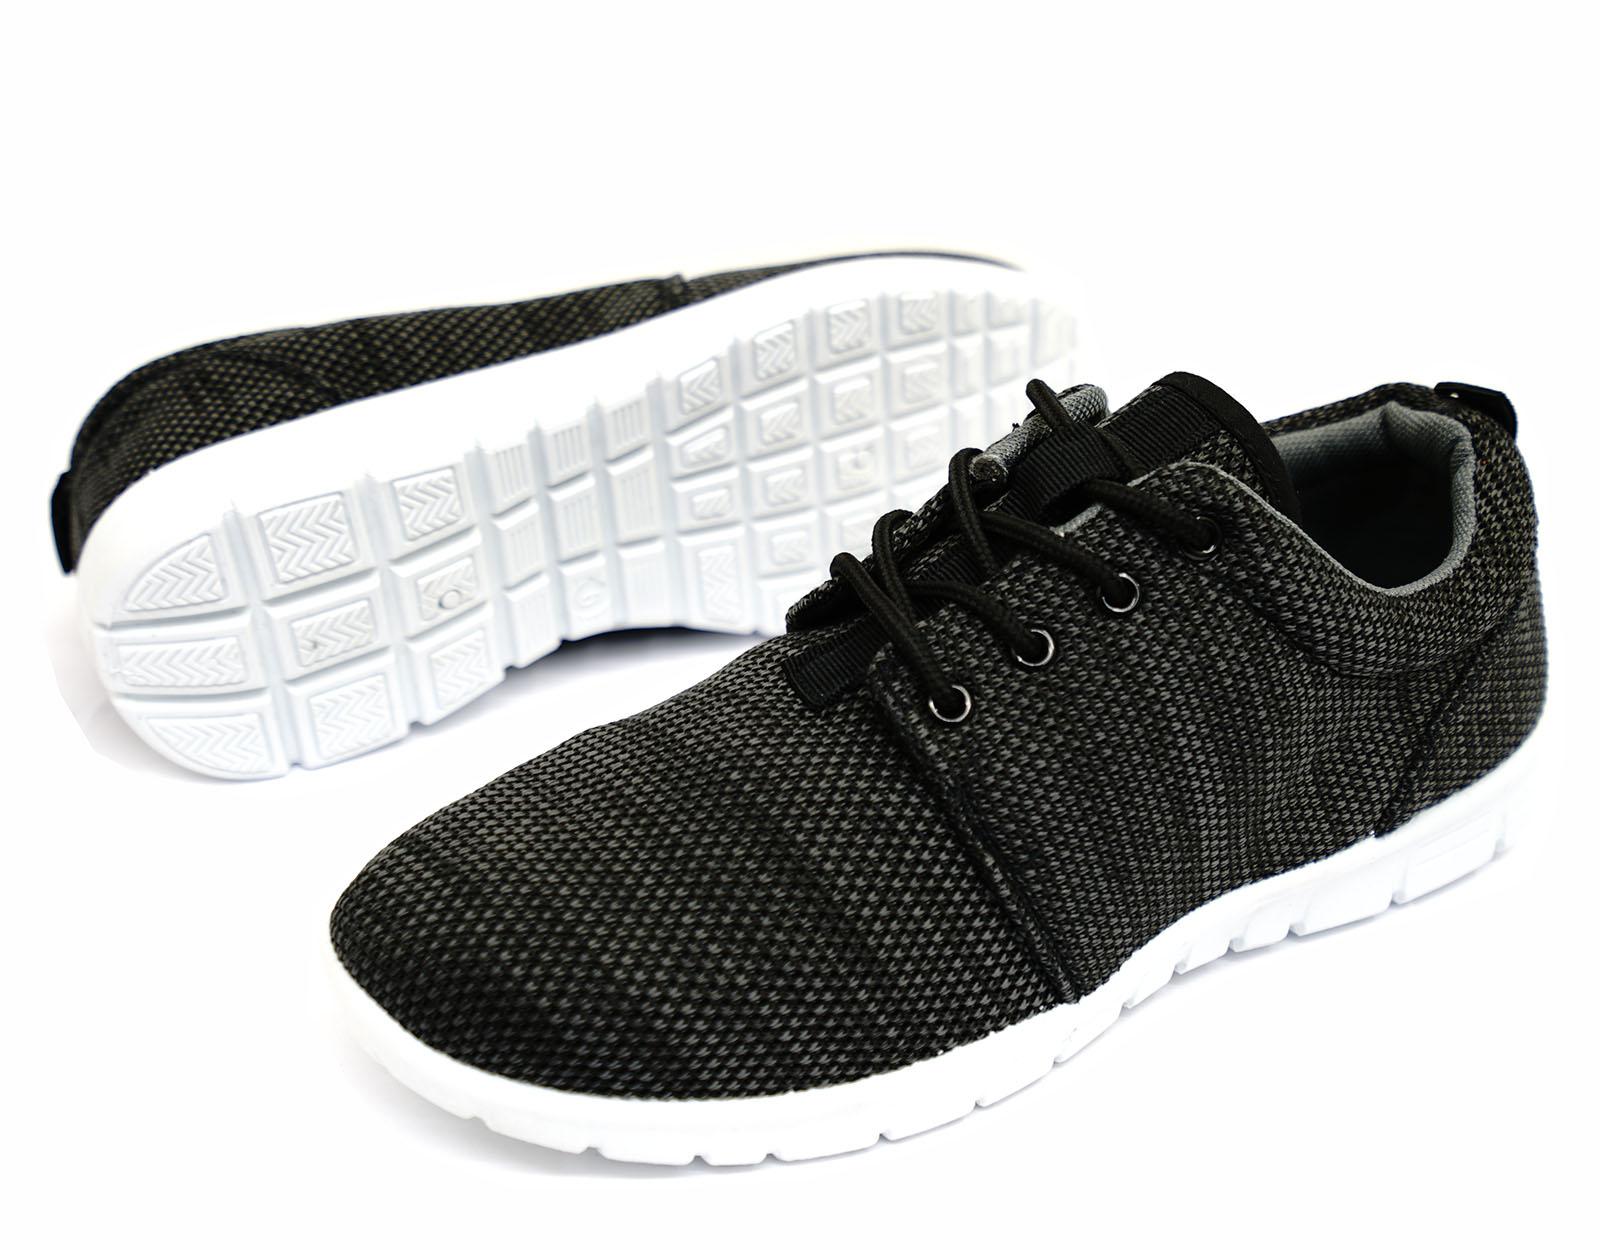 Herren grau zum Schnüren Memory foam Turnschuhe Freizeit Plimsolls Pumps Schuhe